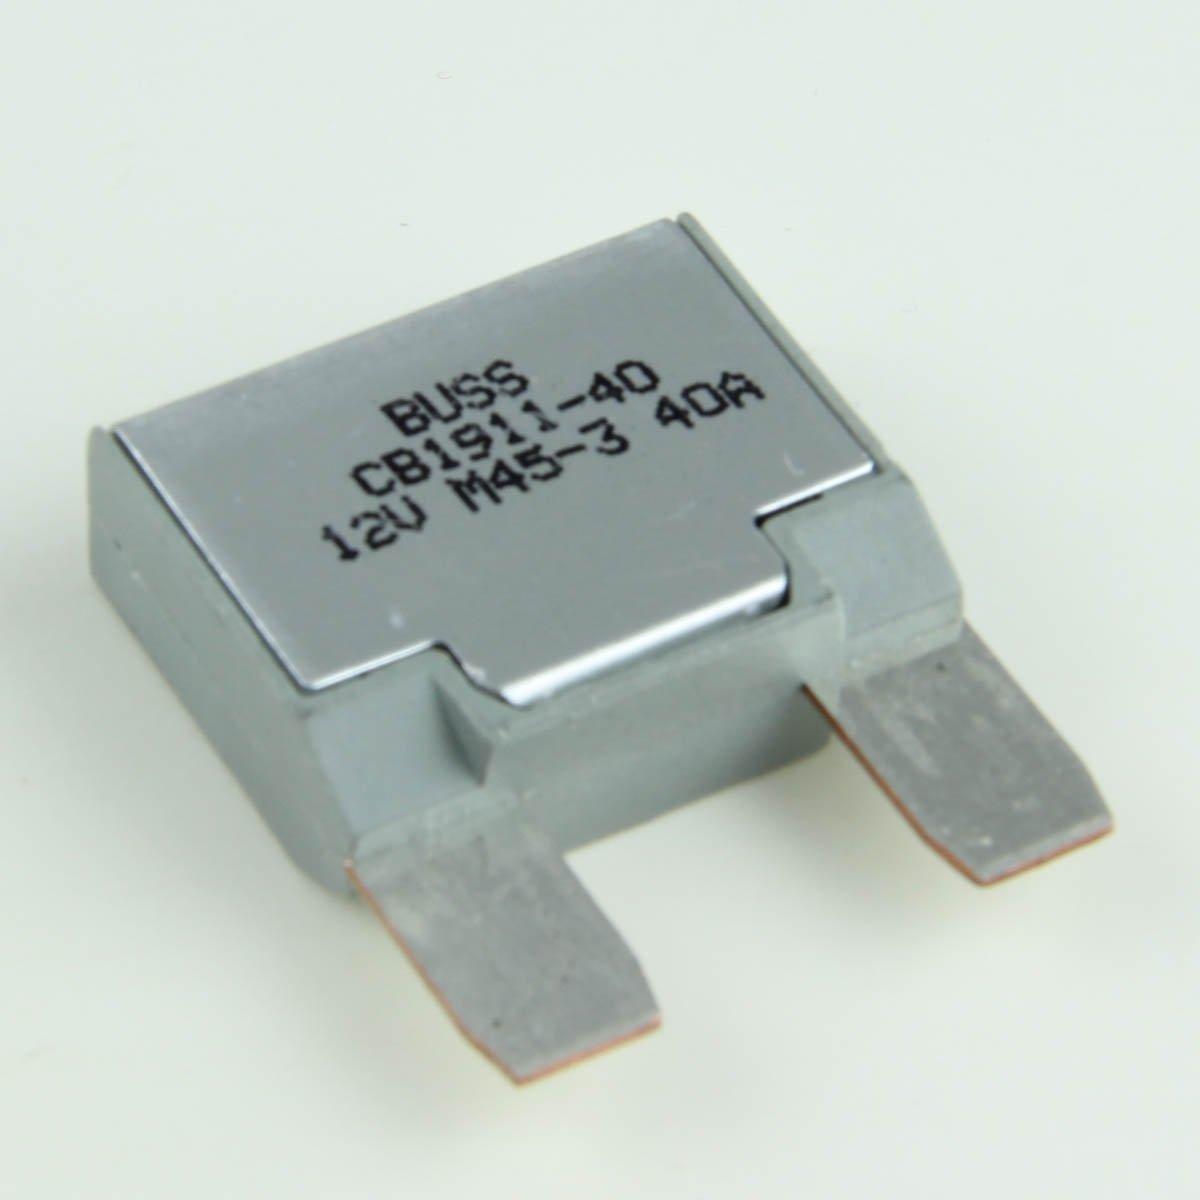 40 Amp Auto-Reset Maxi Blade-Style Circuit Breakers (1 per pack) Crimp Supply LEPUSPTLSHI6532